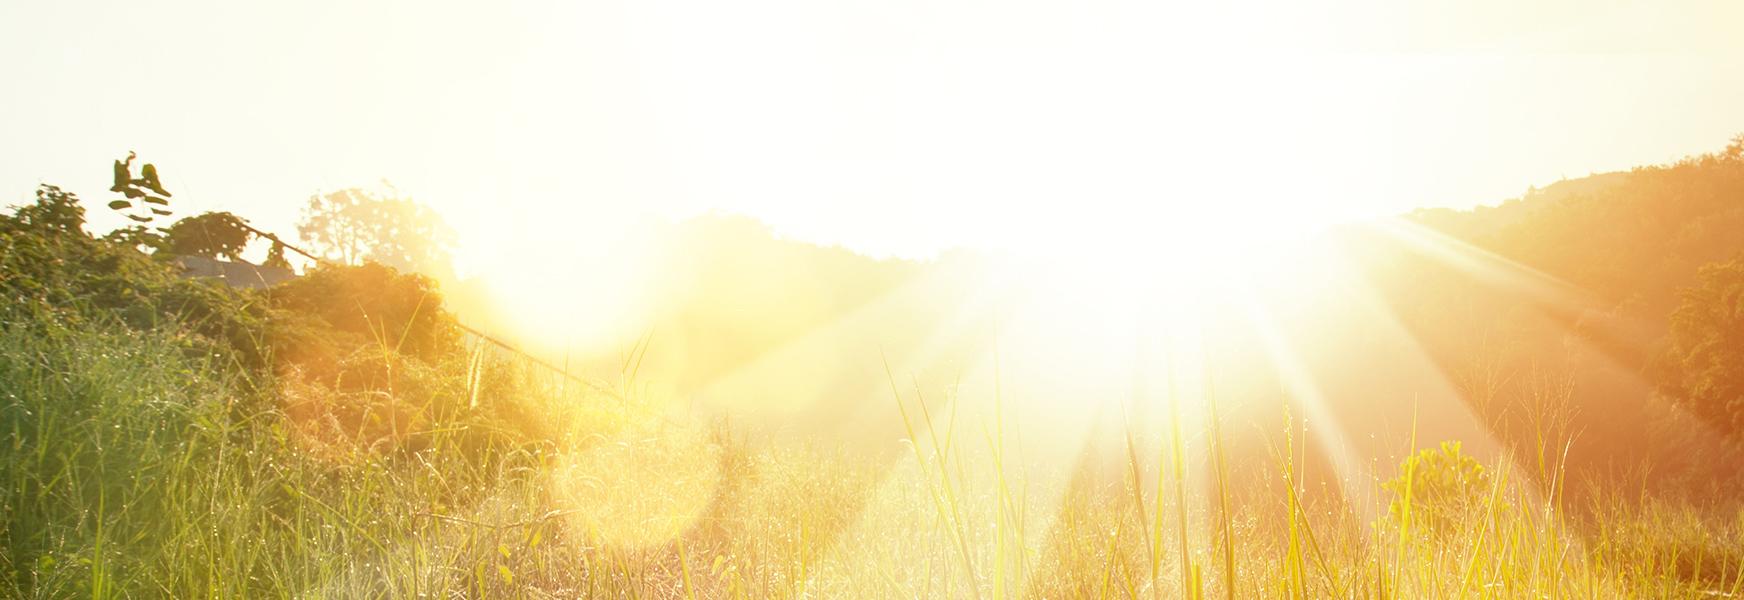 Sun shining over a grassy field